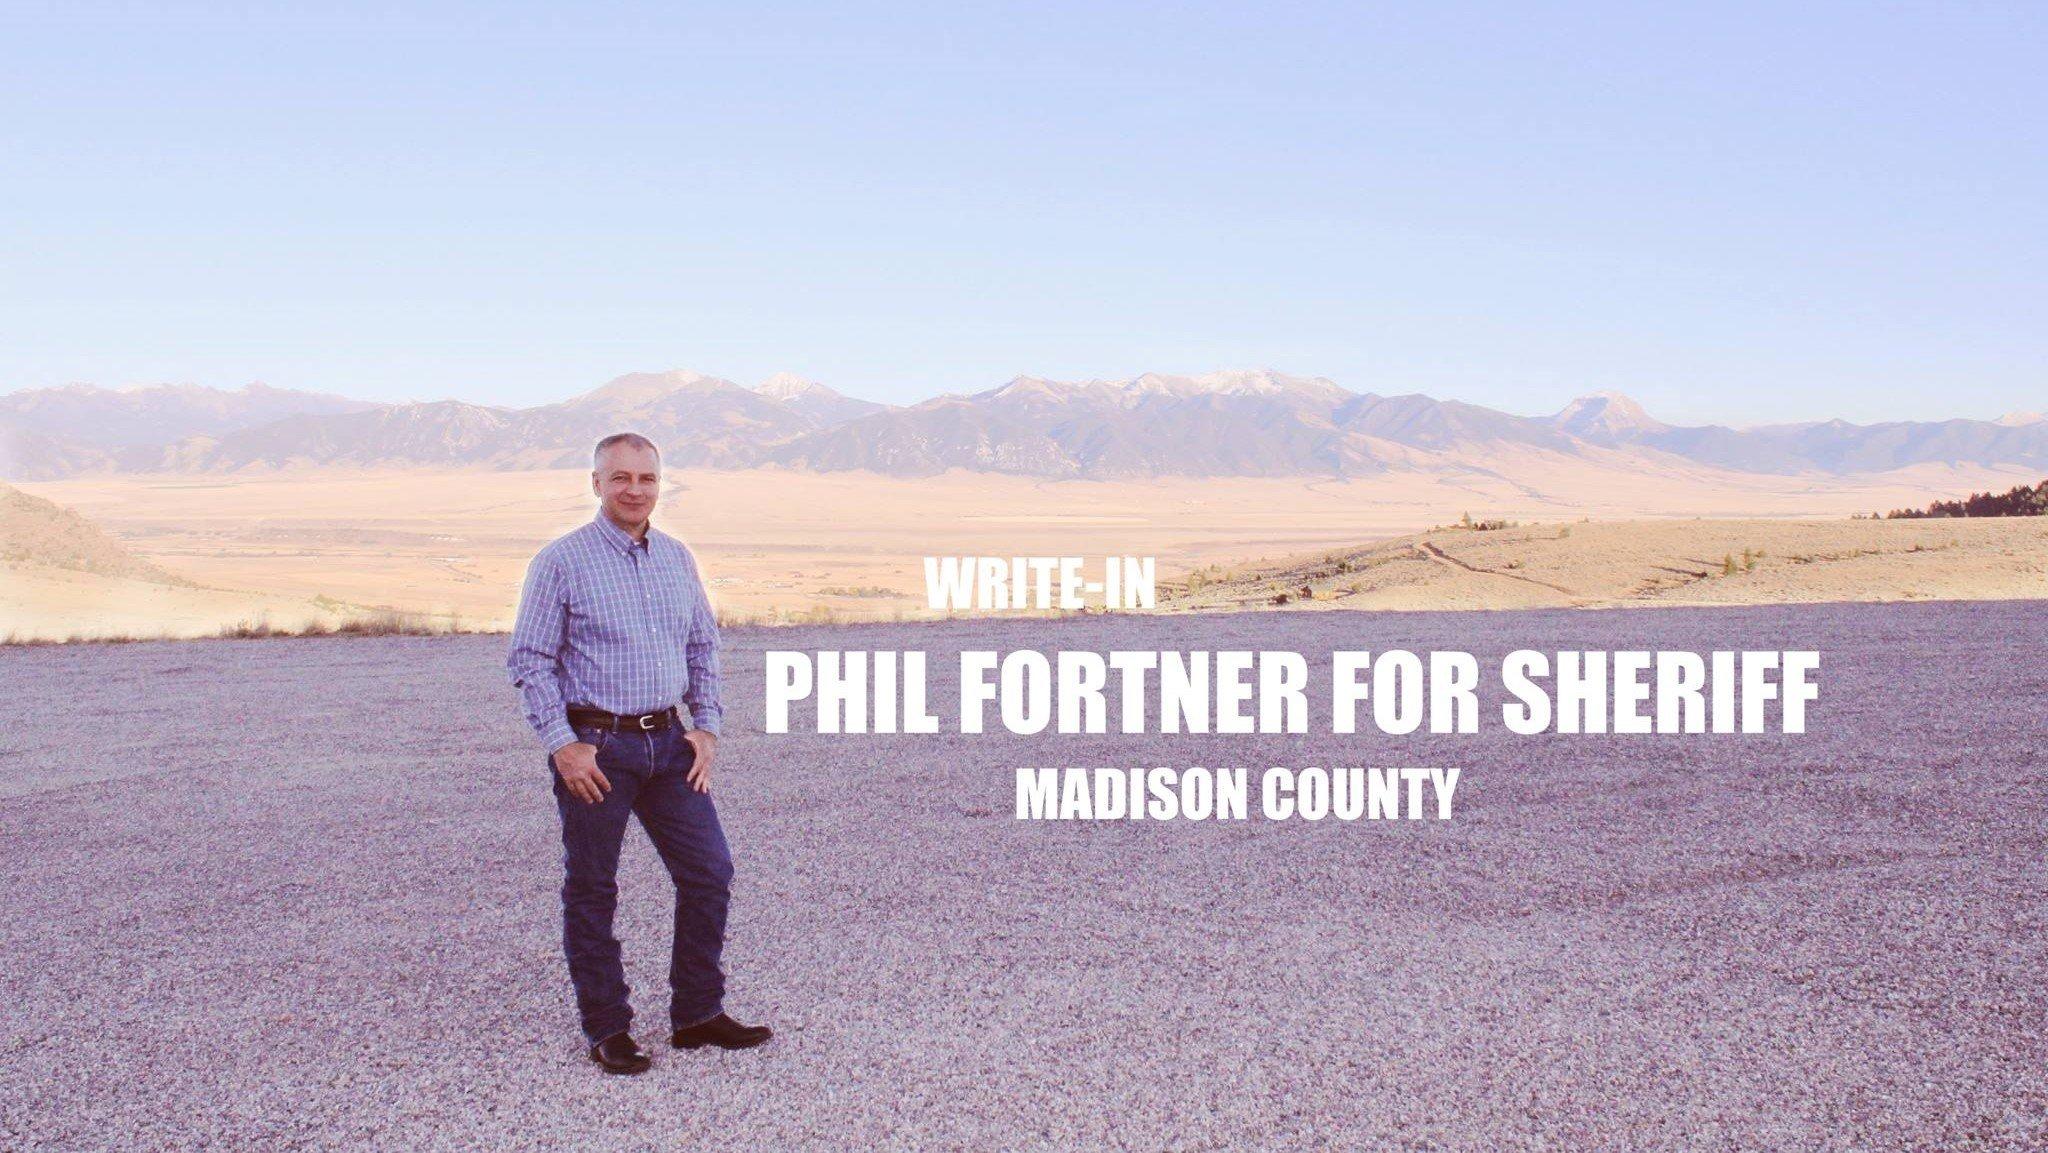 Credit: Phil Fortner for Sheriff